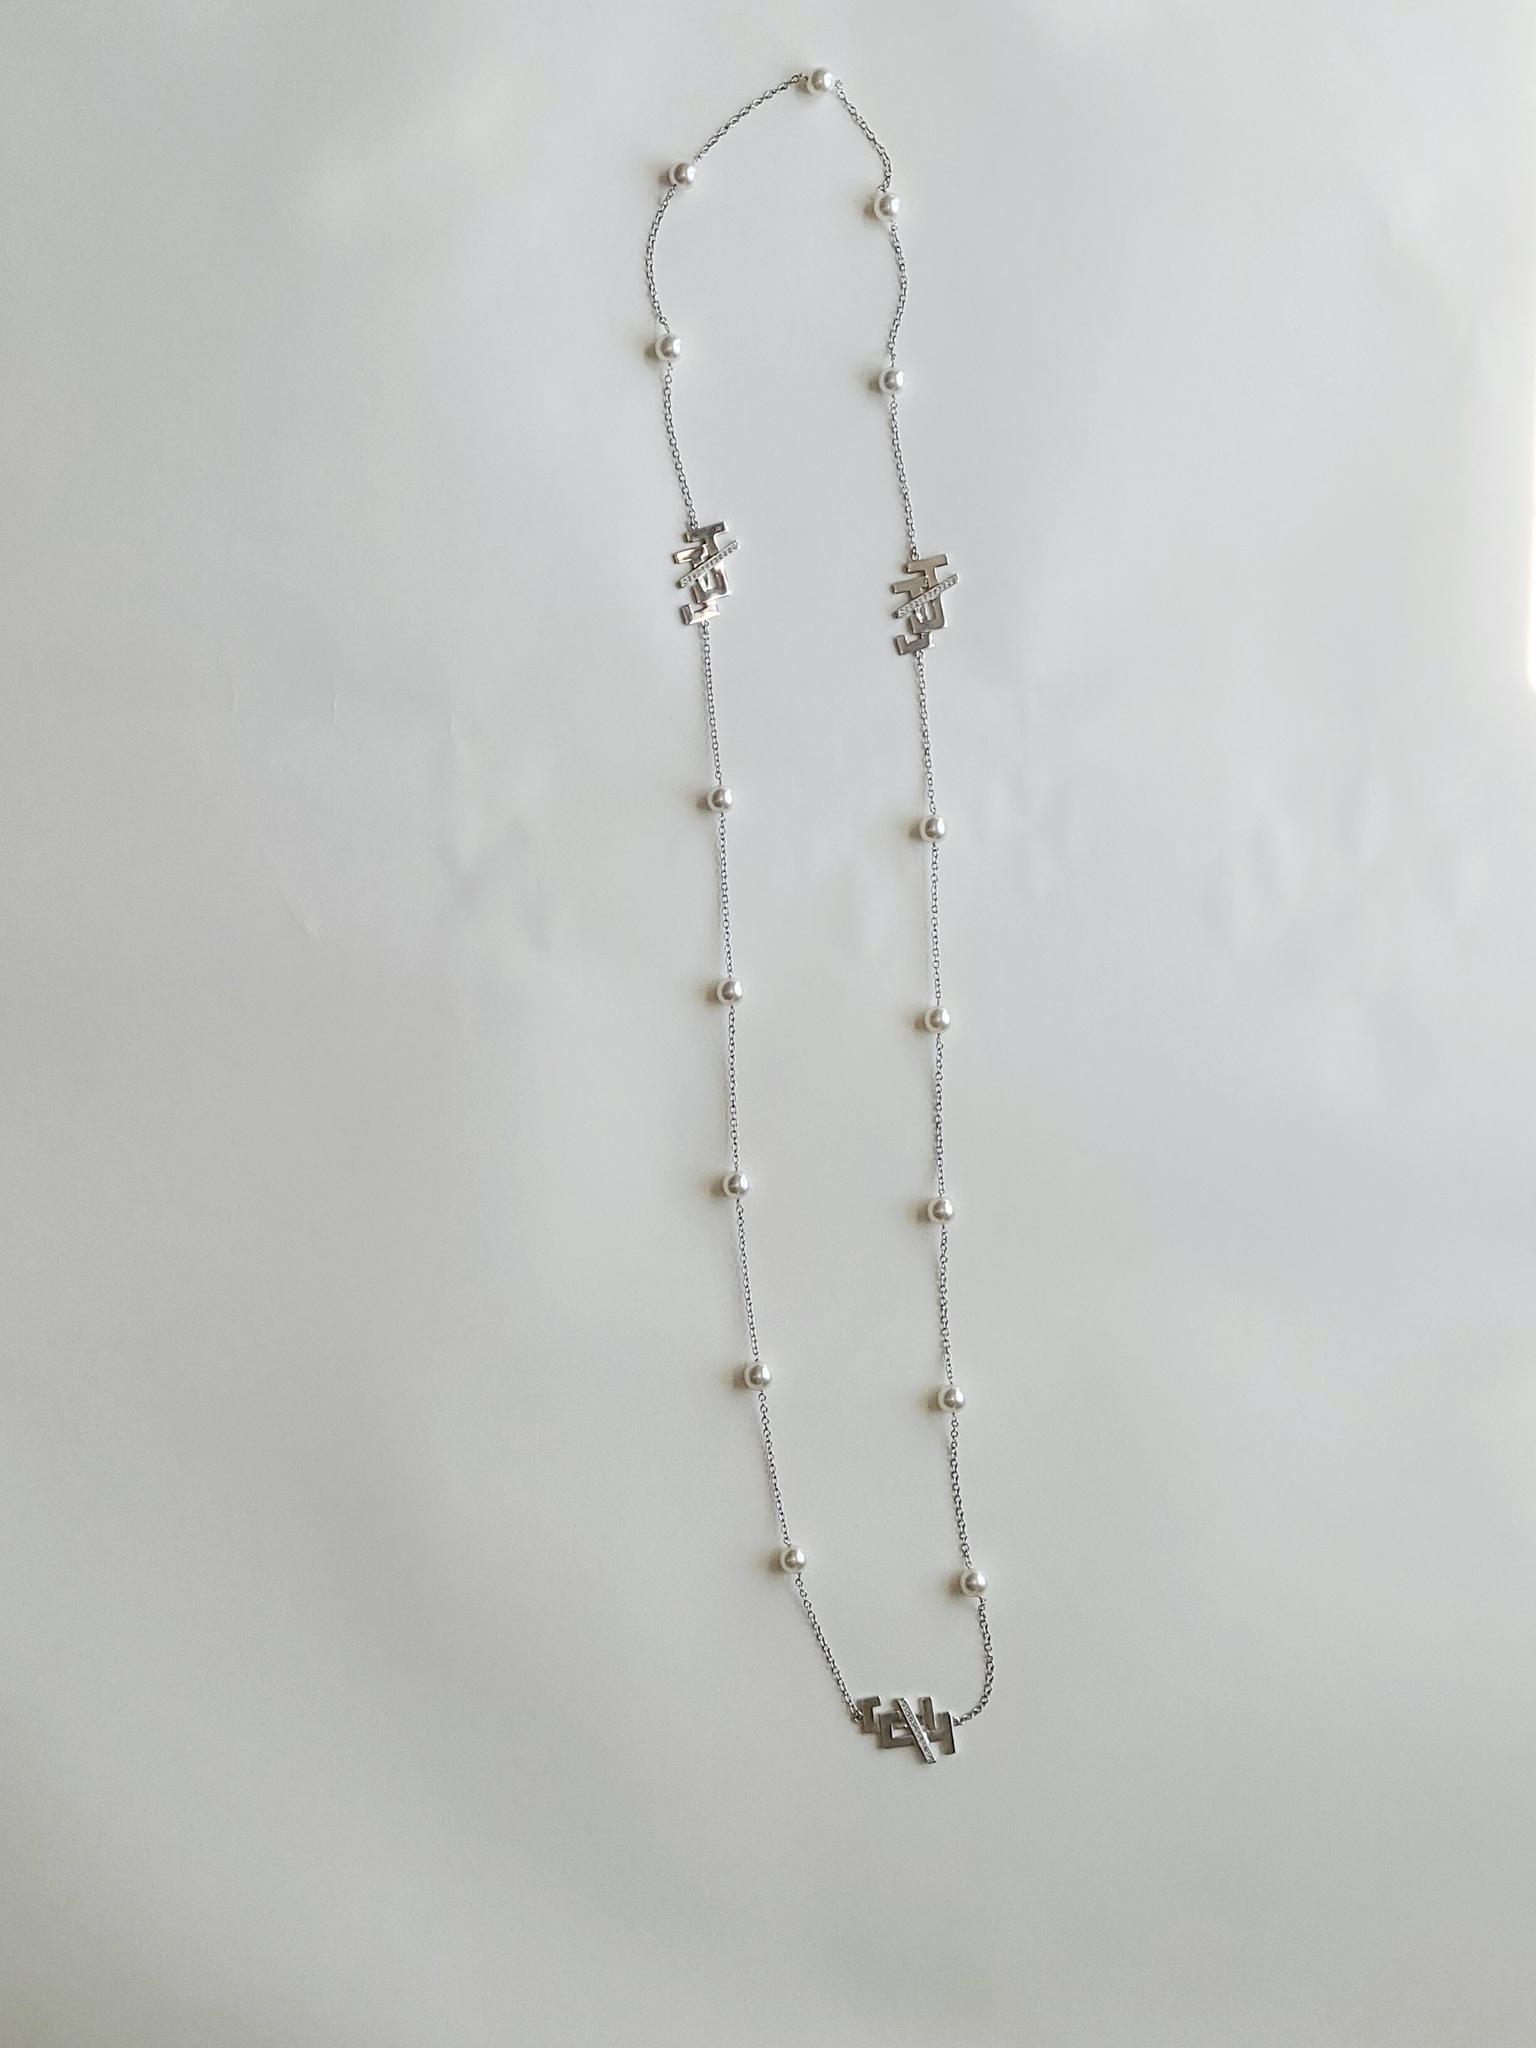 Jack N Jill Silver Pearl Necklace